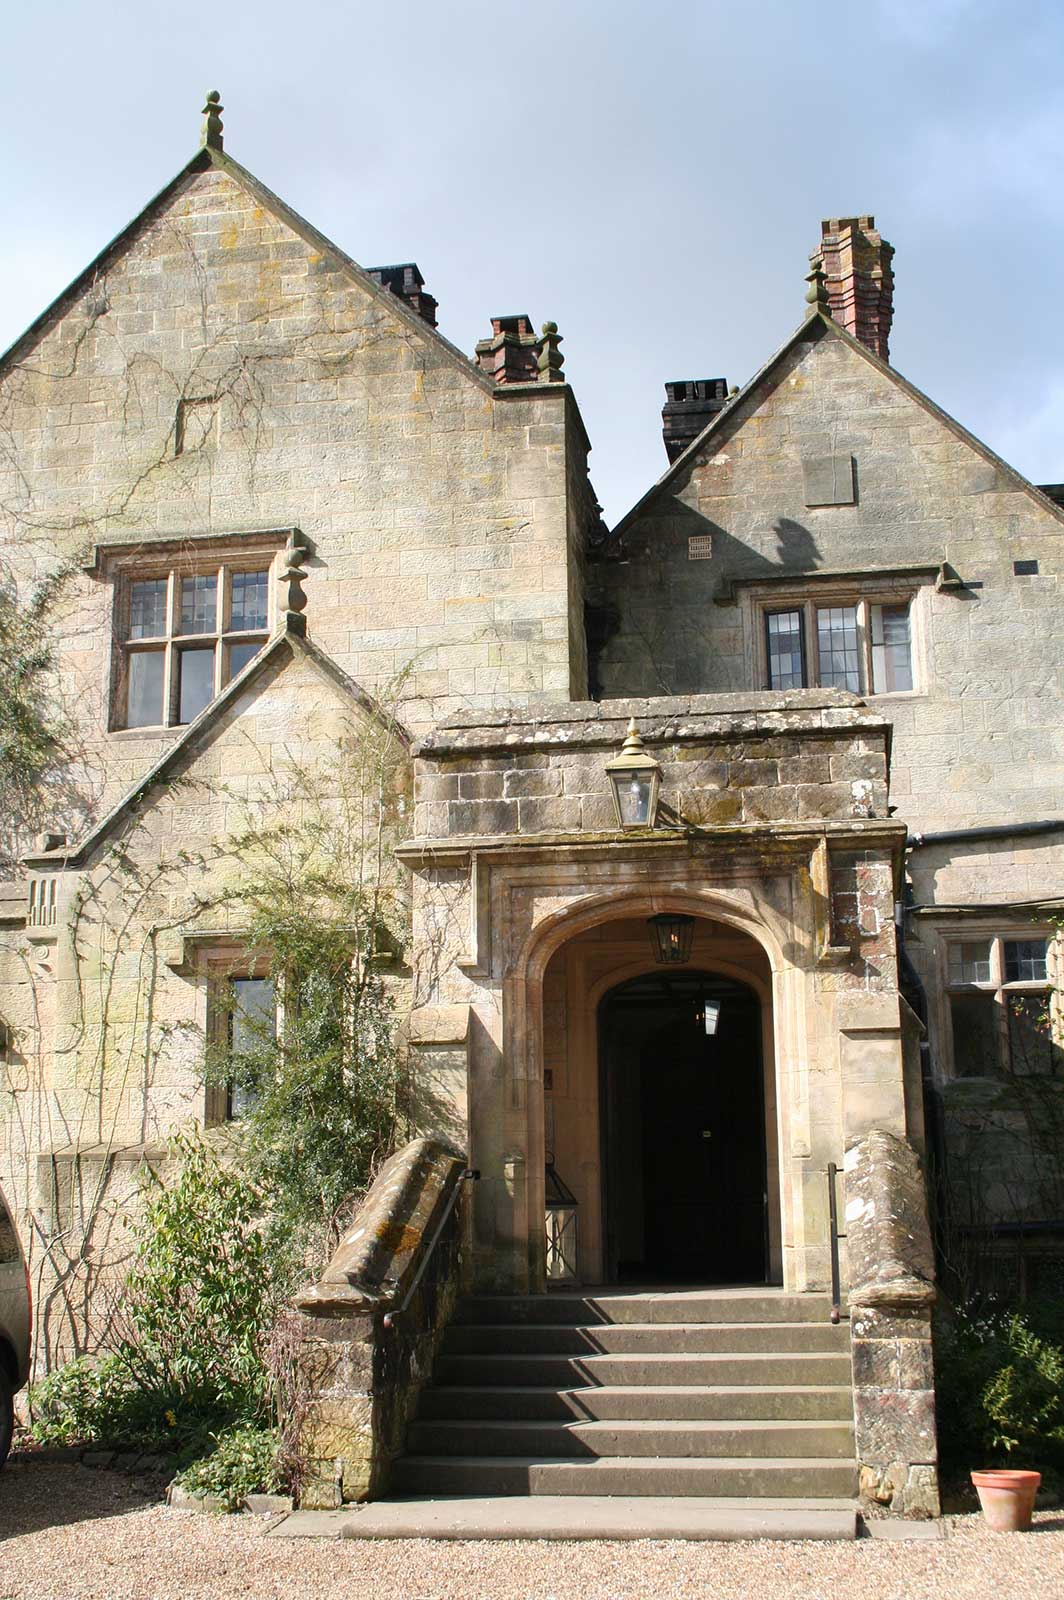 Gravetye Manor with Glass Entrance Doors